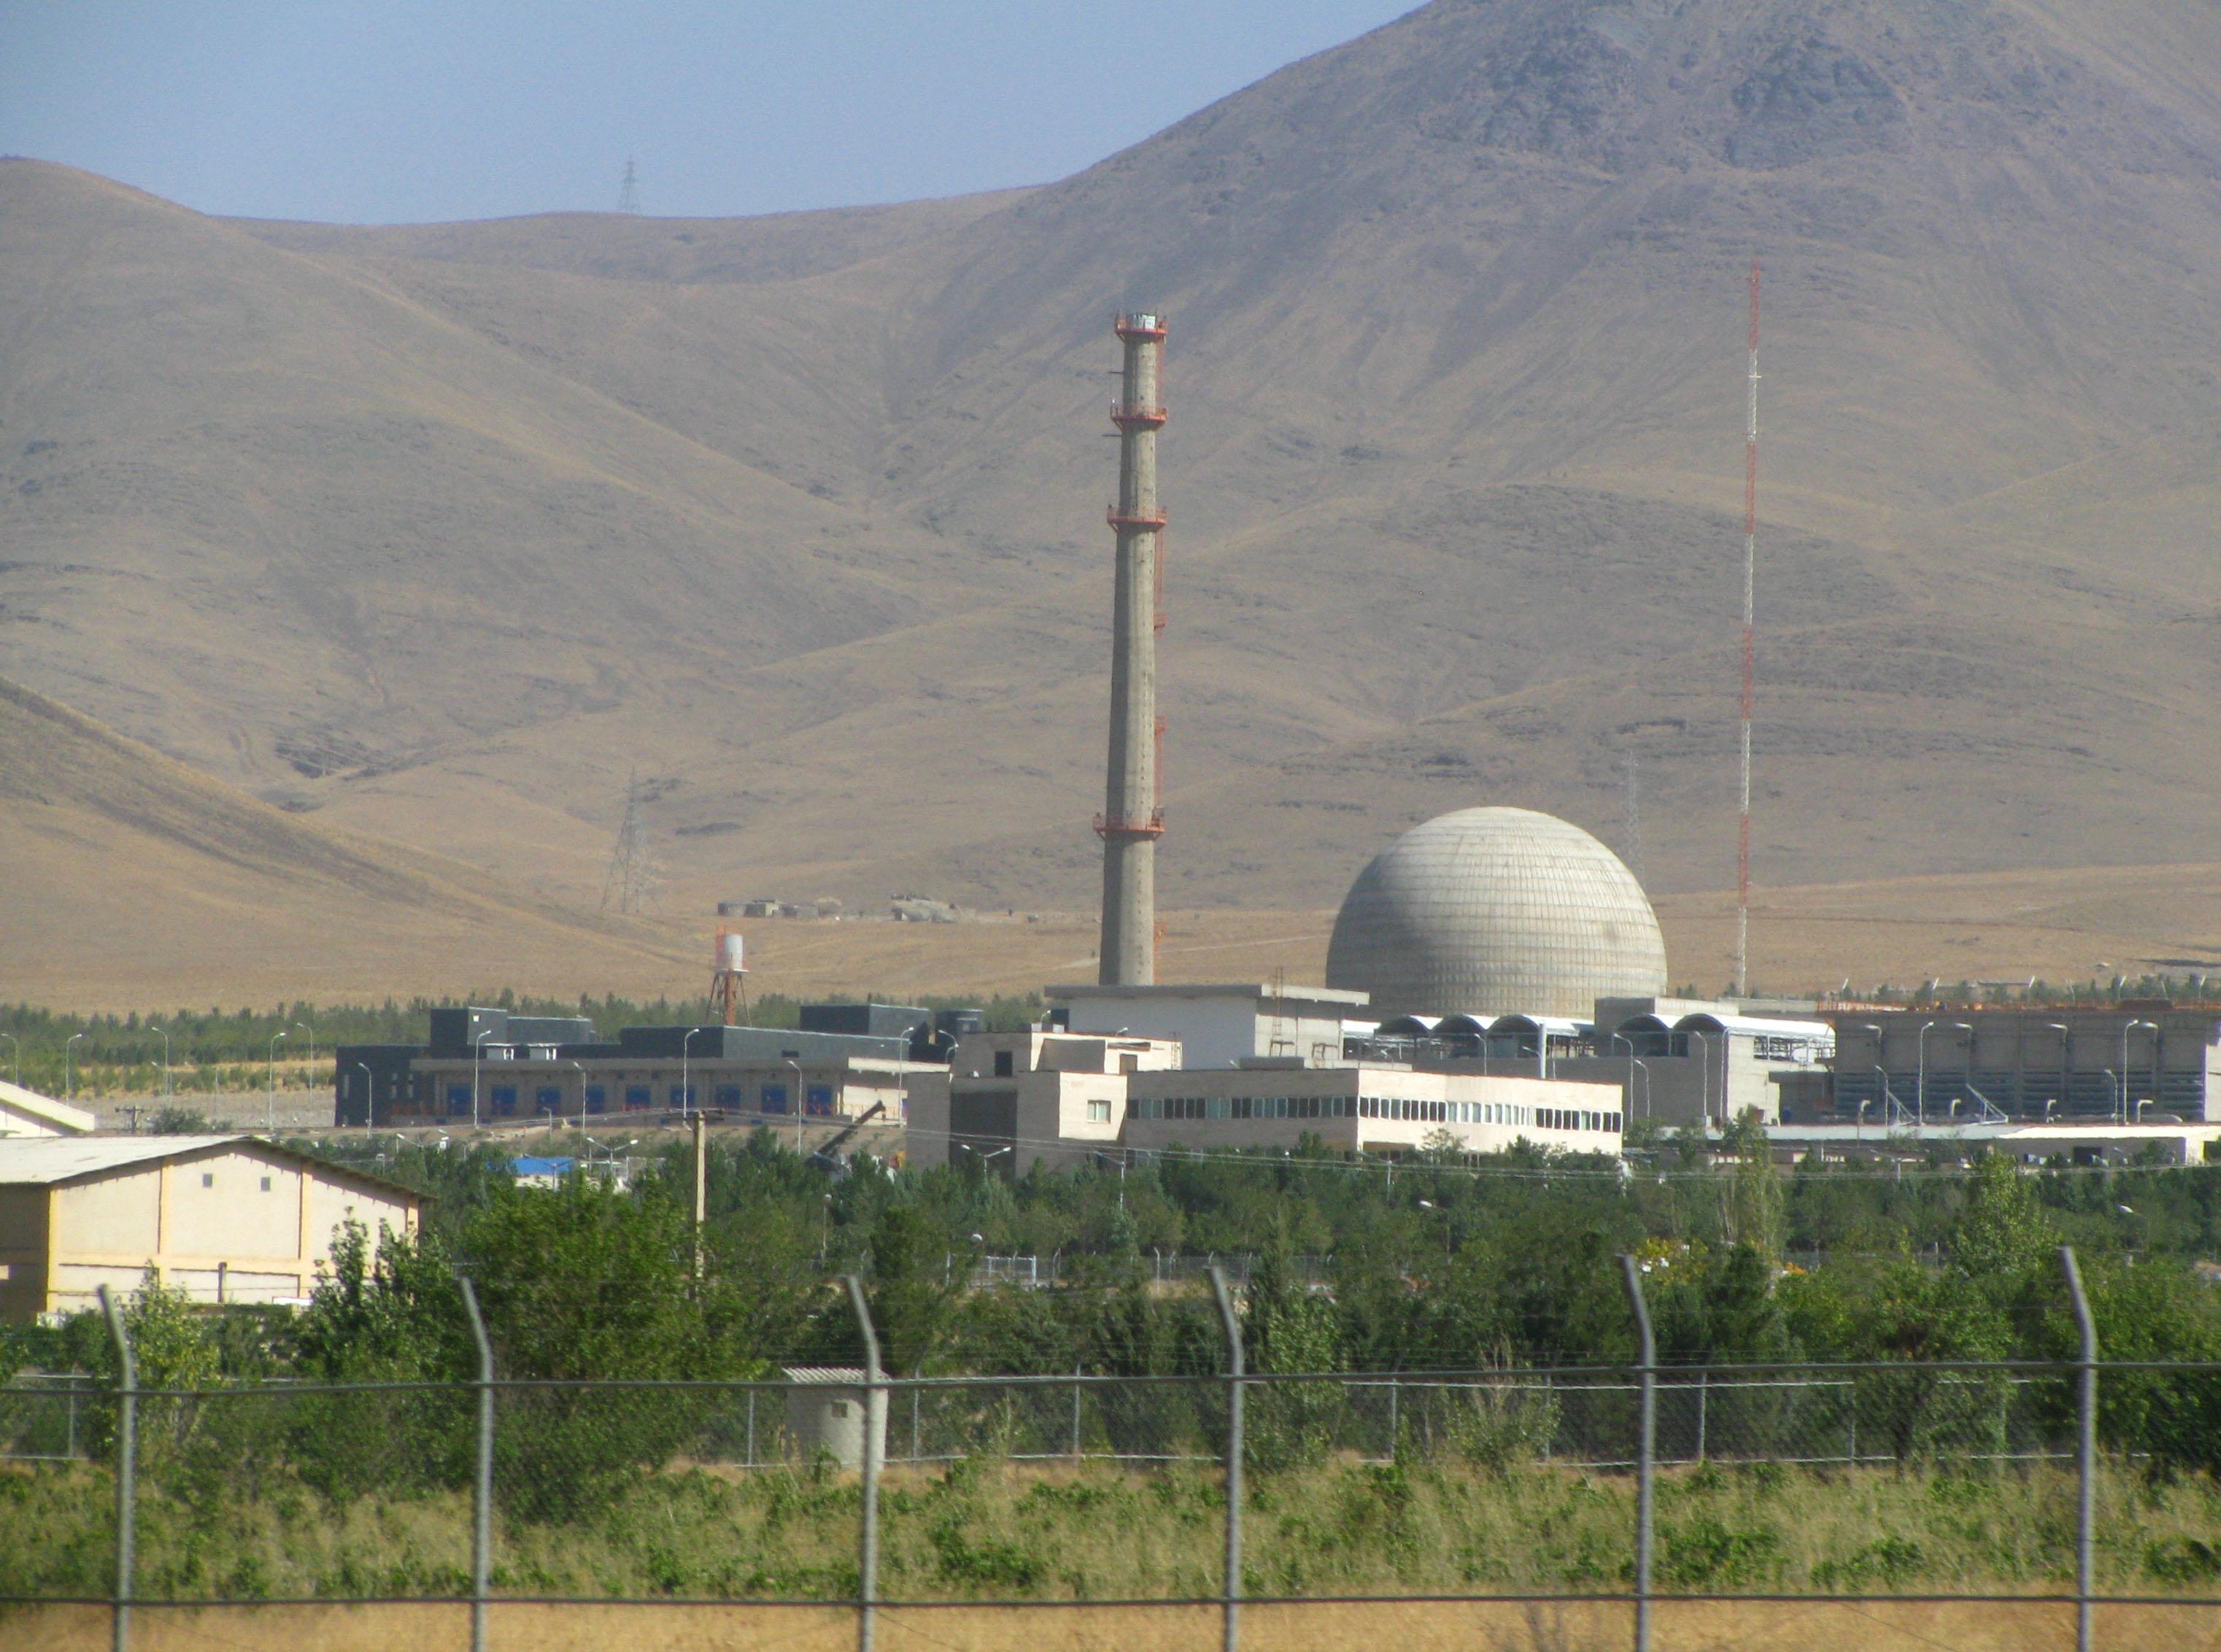 The Arak heavy water plant in Iran